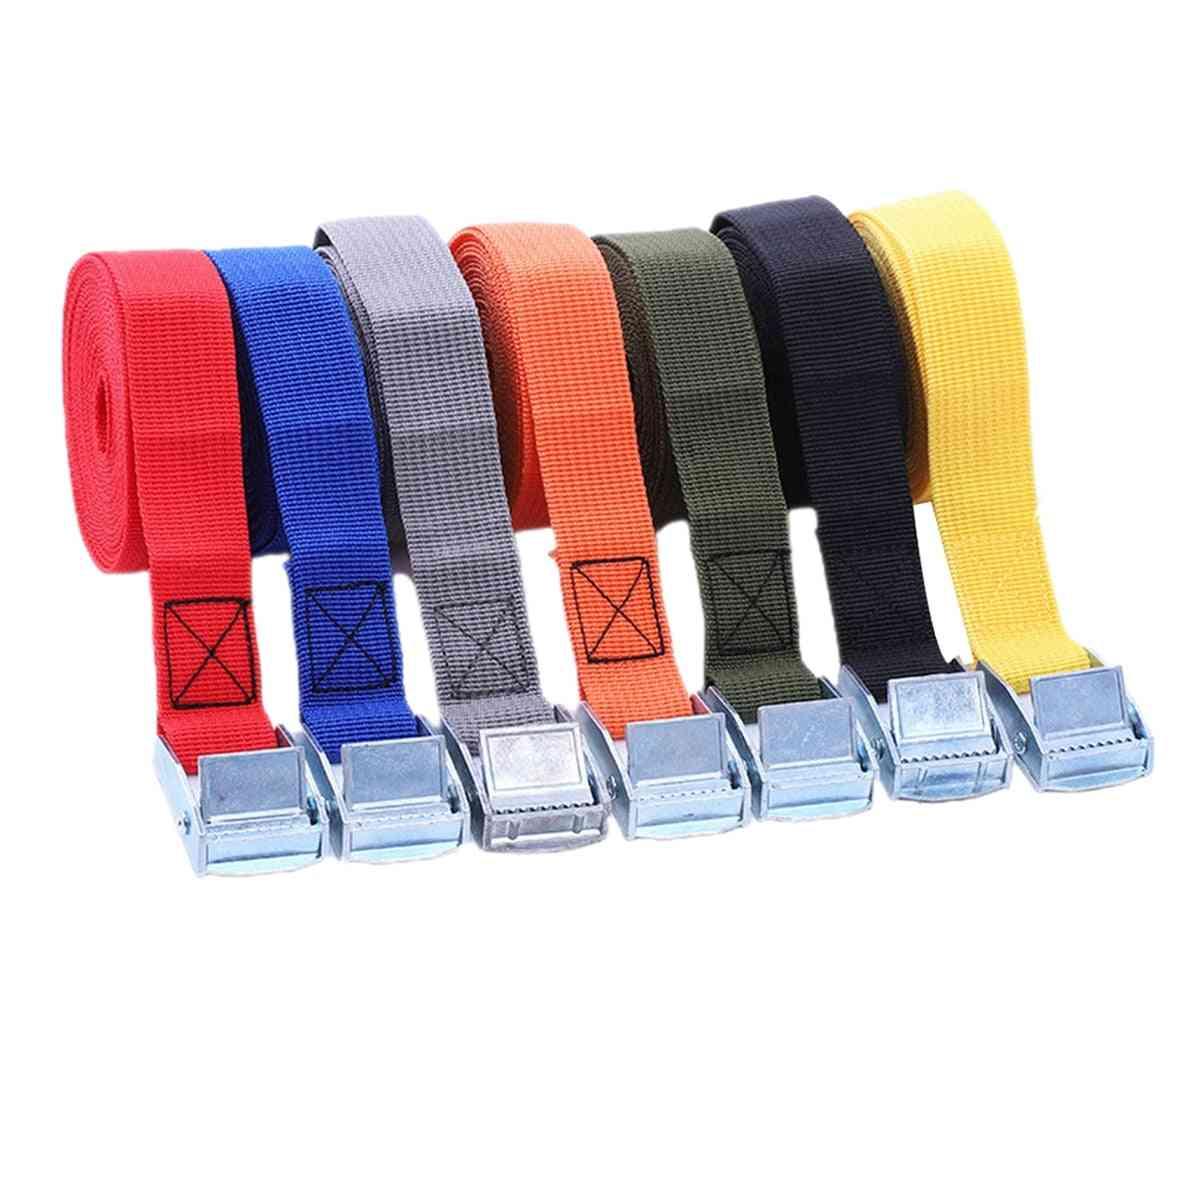 Multifunctional Bundling Belt - Ratchet Straps With Strong Buckle